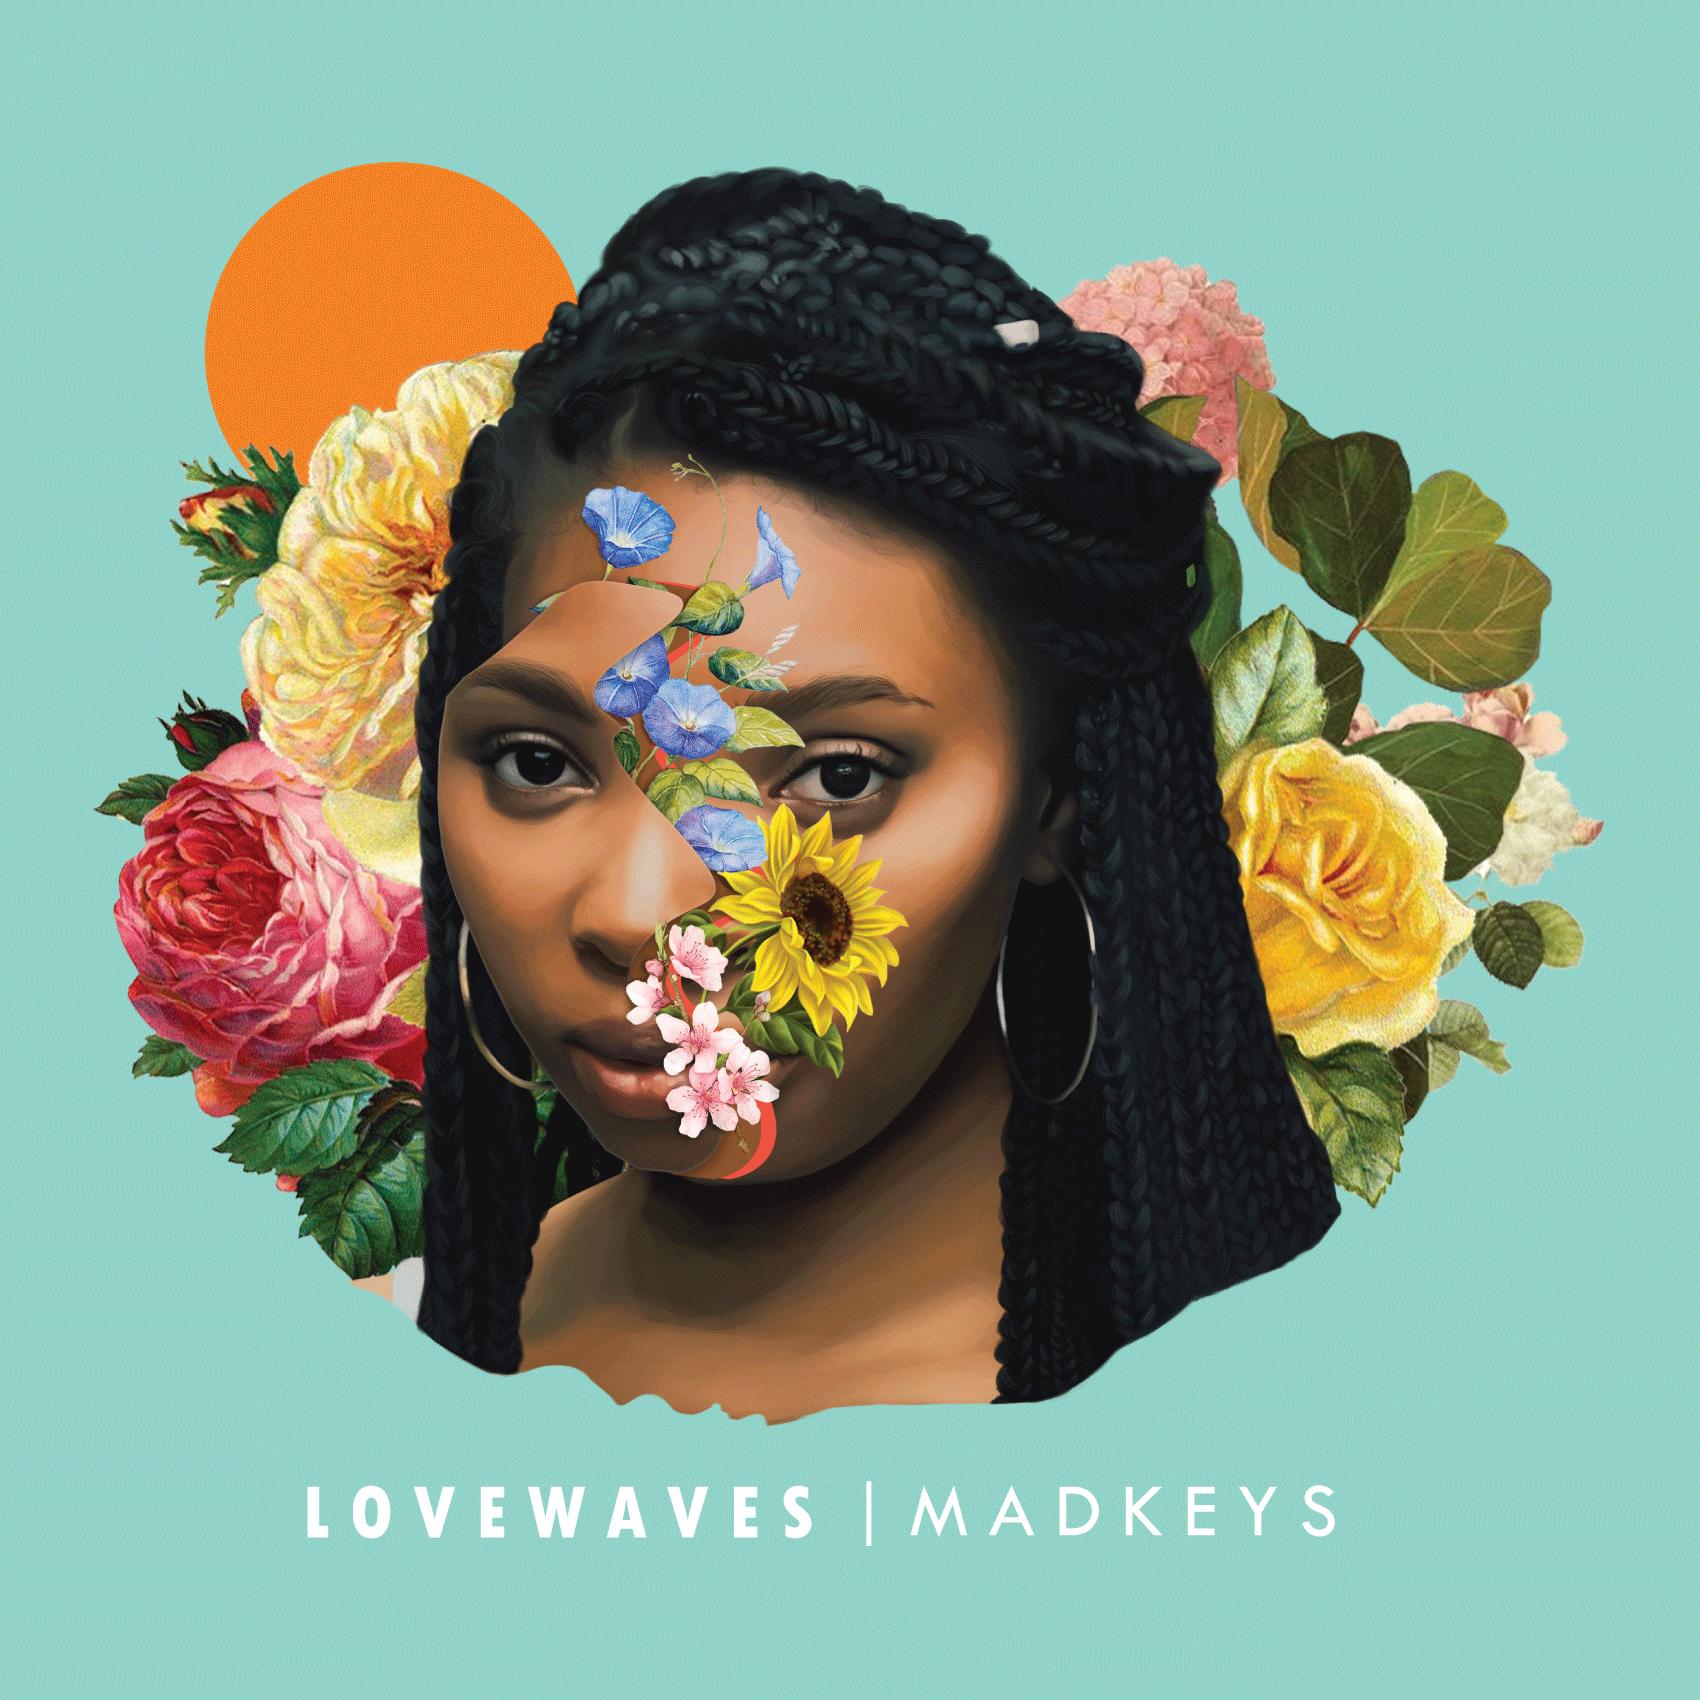 LoveWaves-(art-for-digital).png